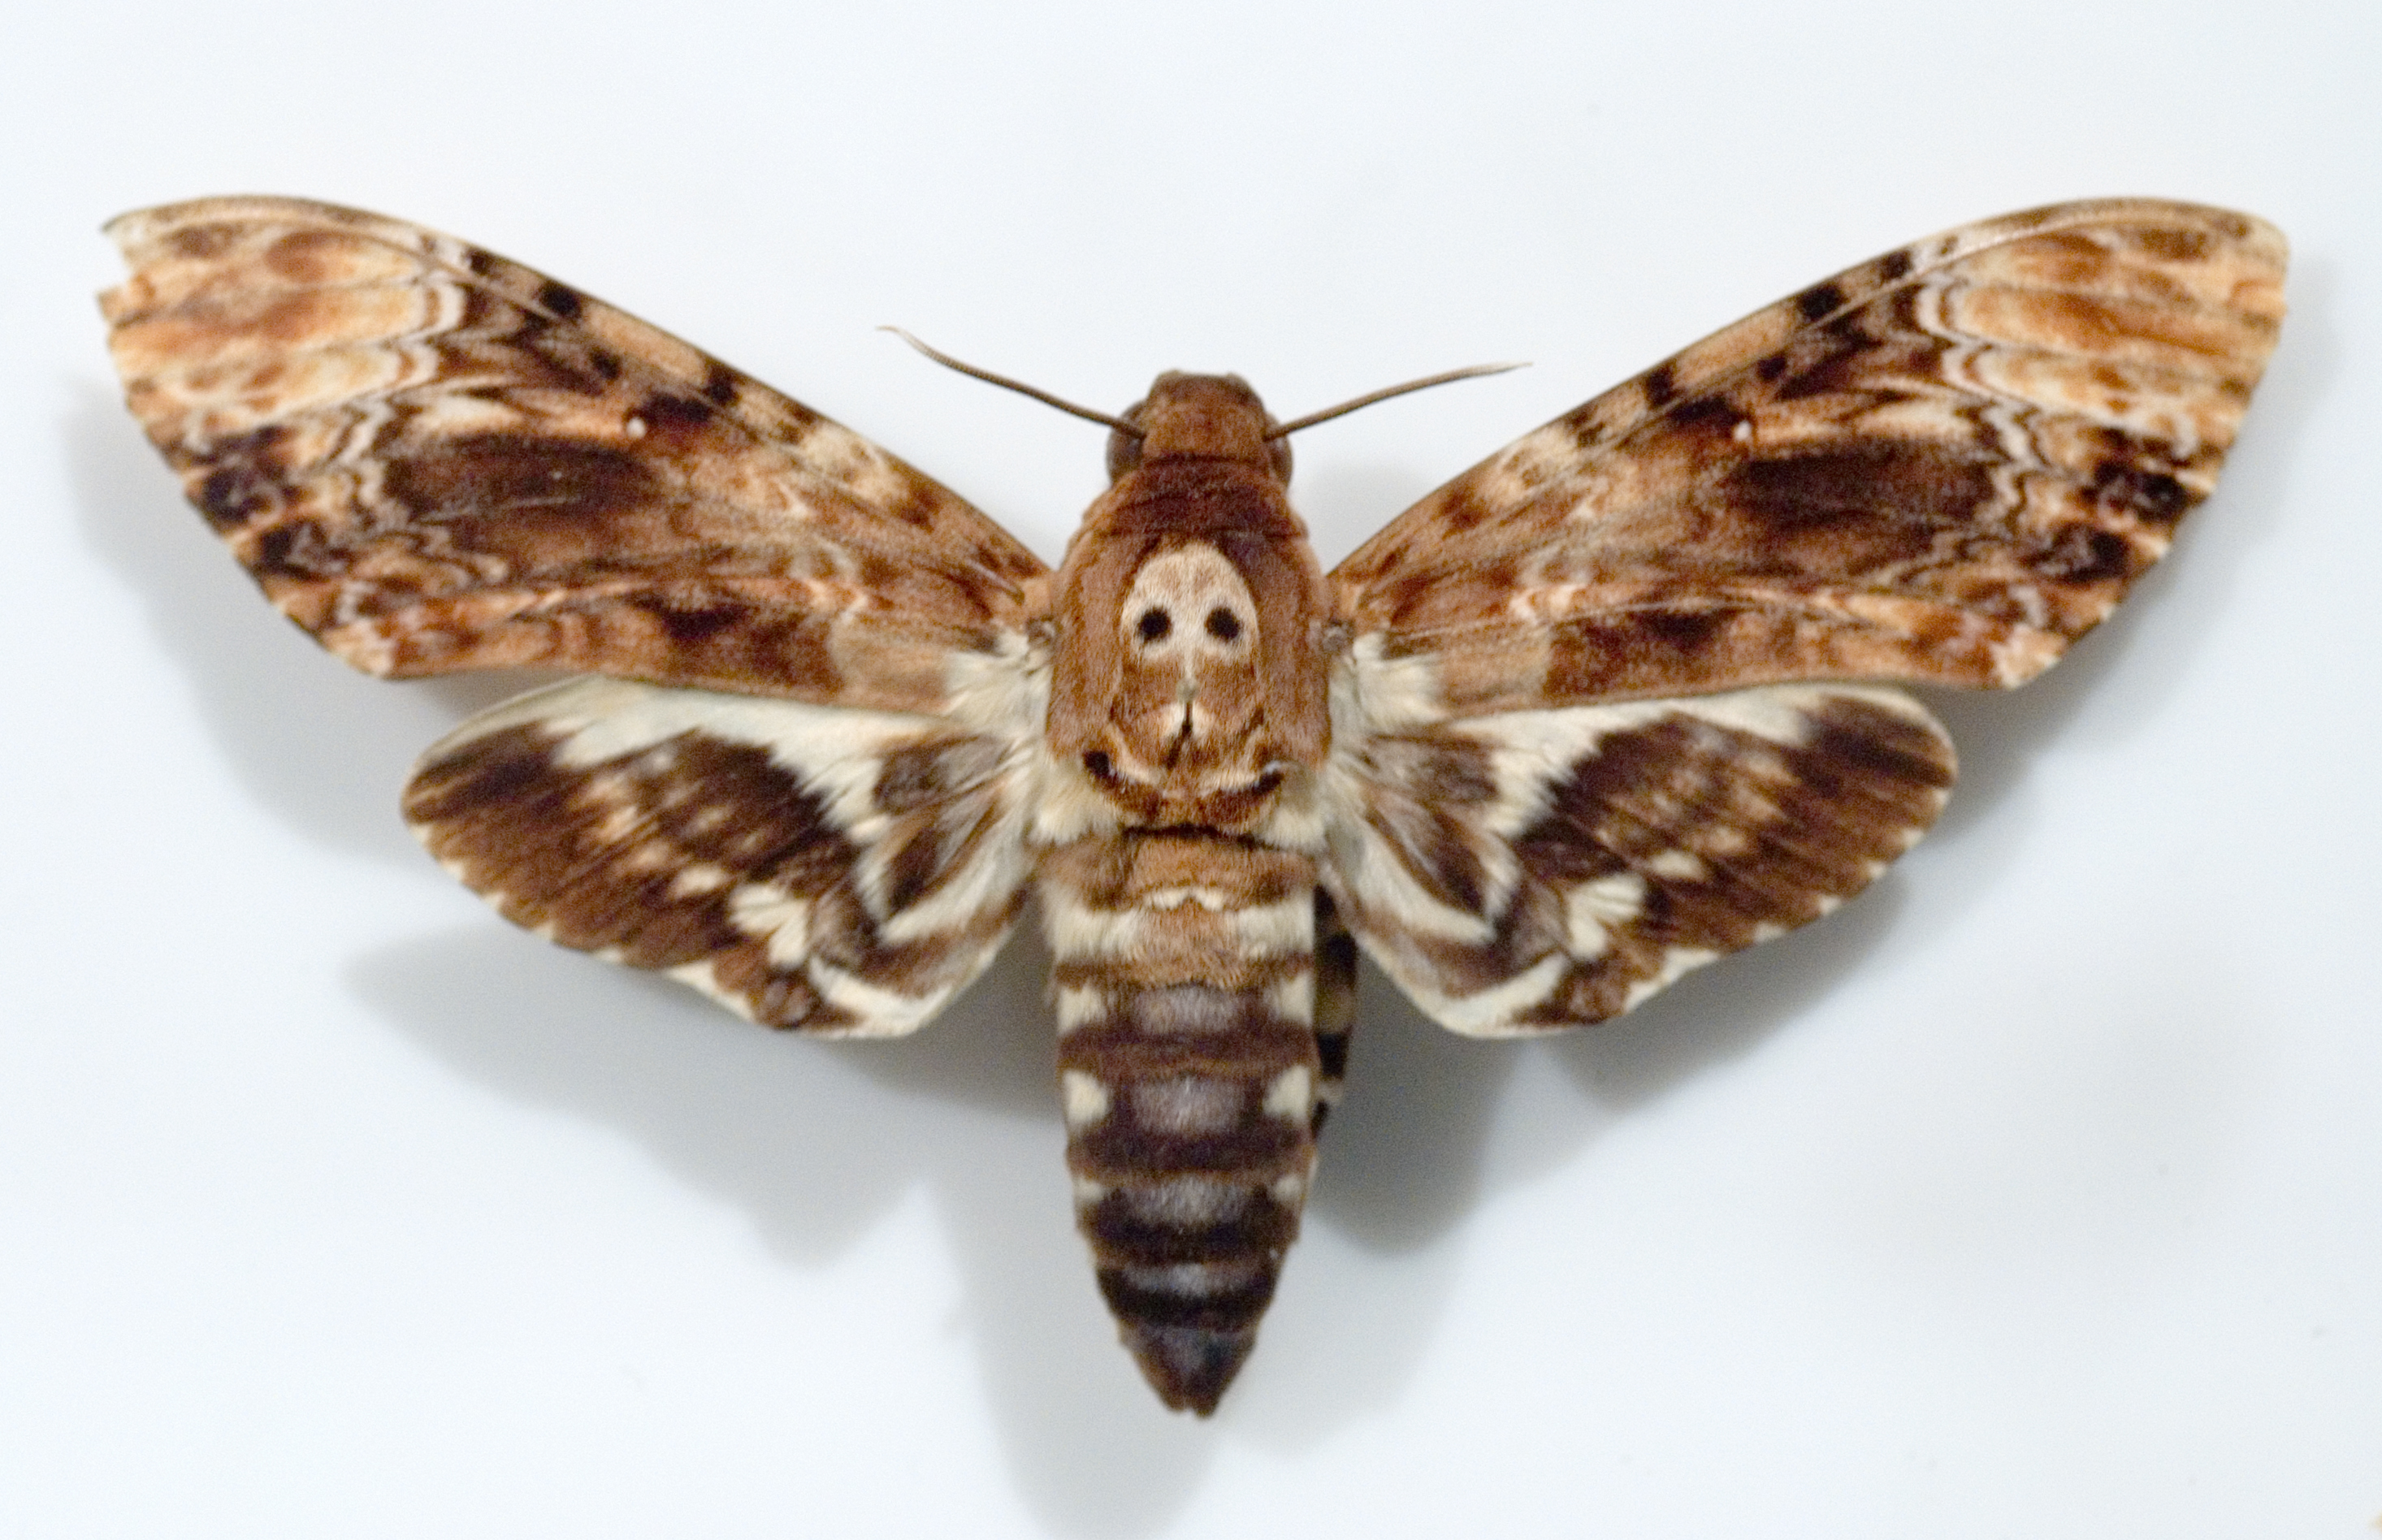 бабочка бражник мертвая голова фото